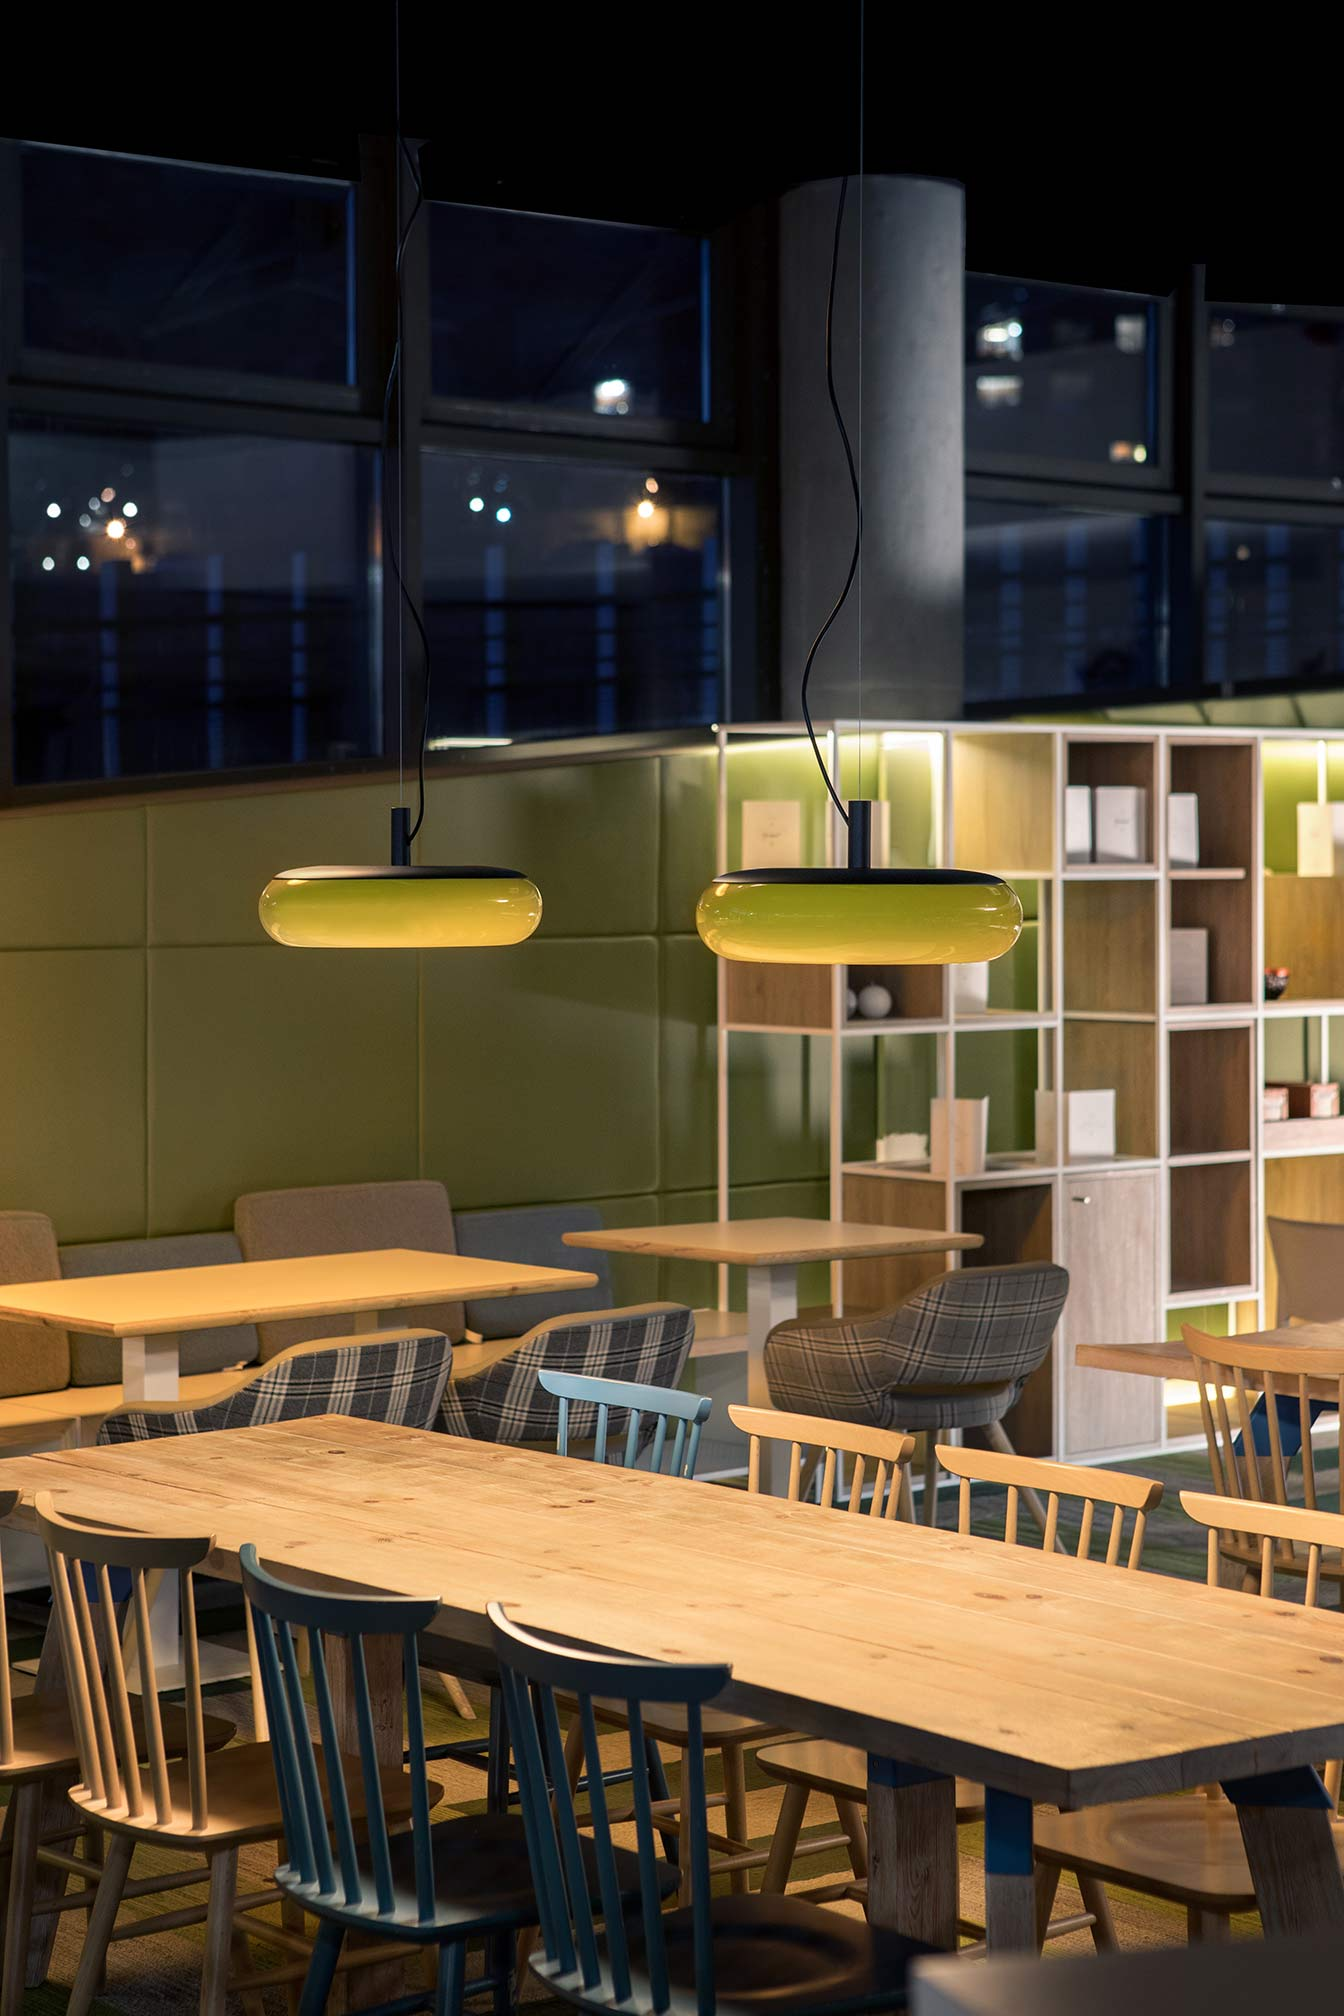 Cafeteria l'Obac - Telecabina Andorra Grandvalira - Rosa Colet